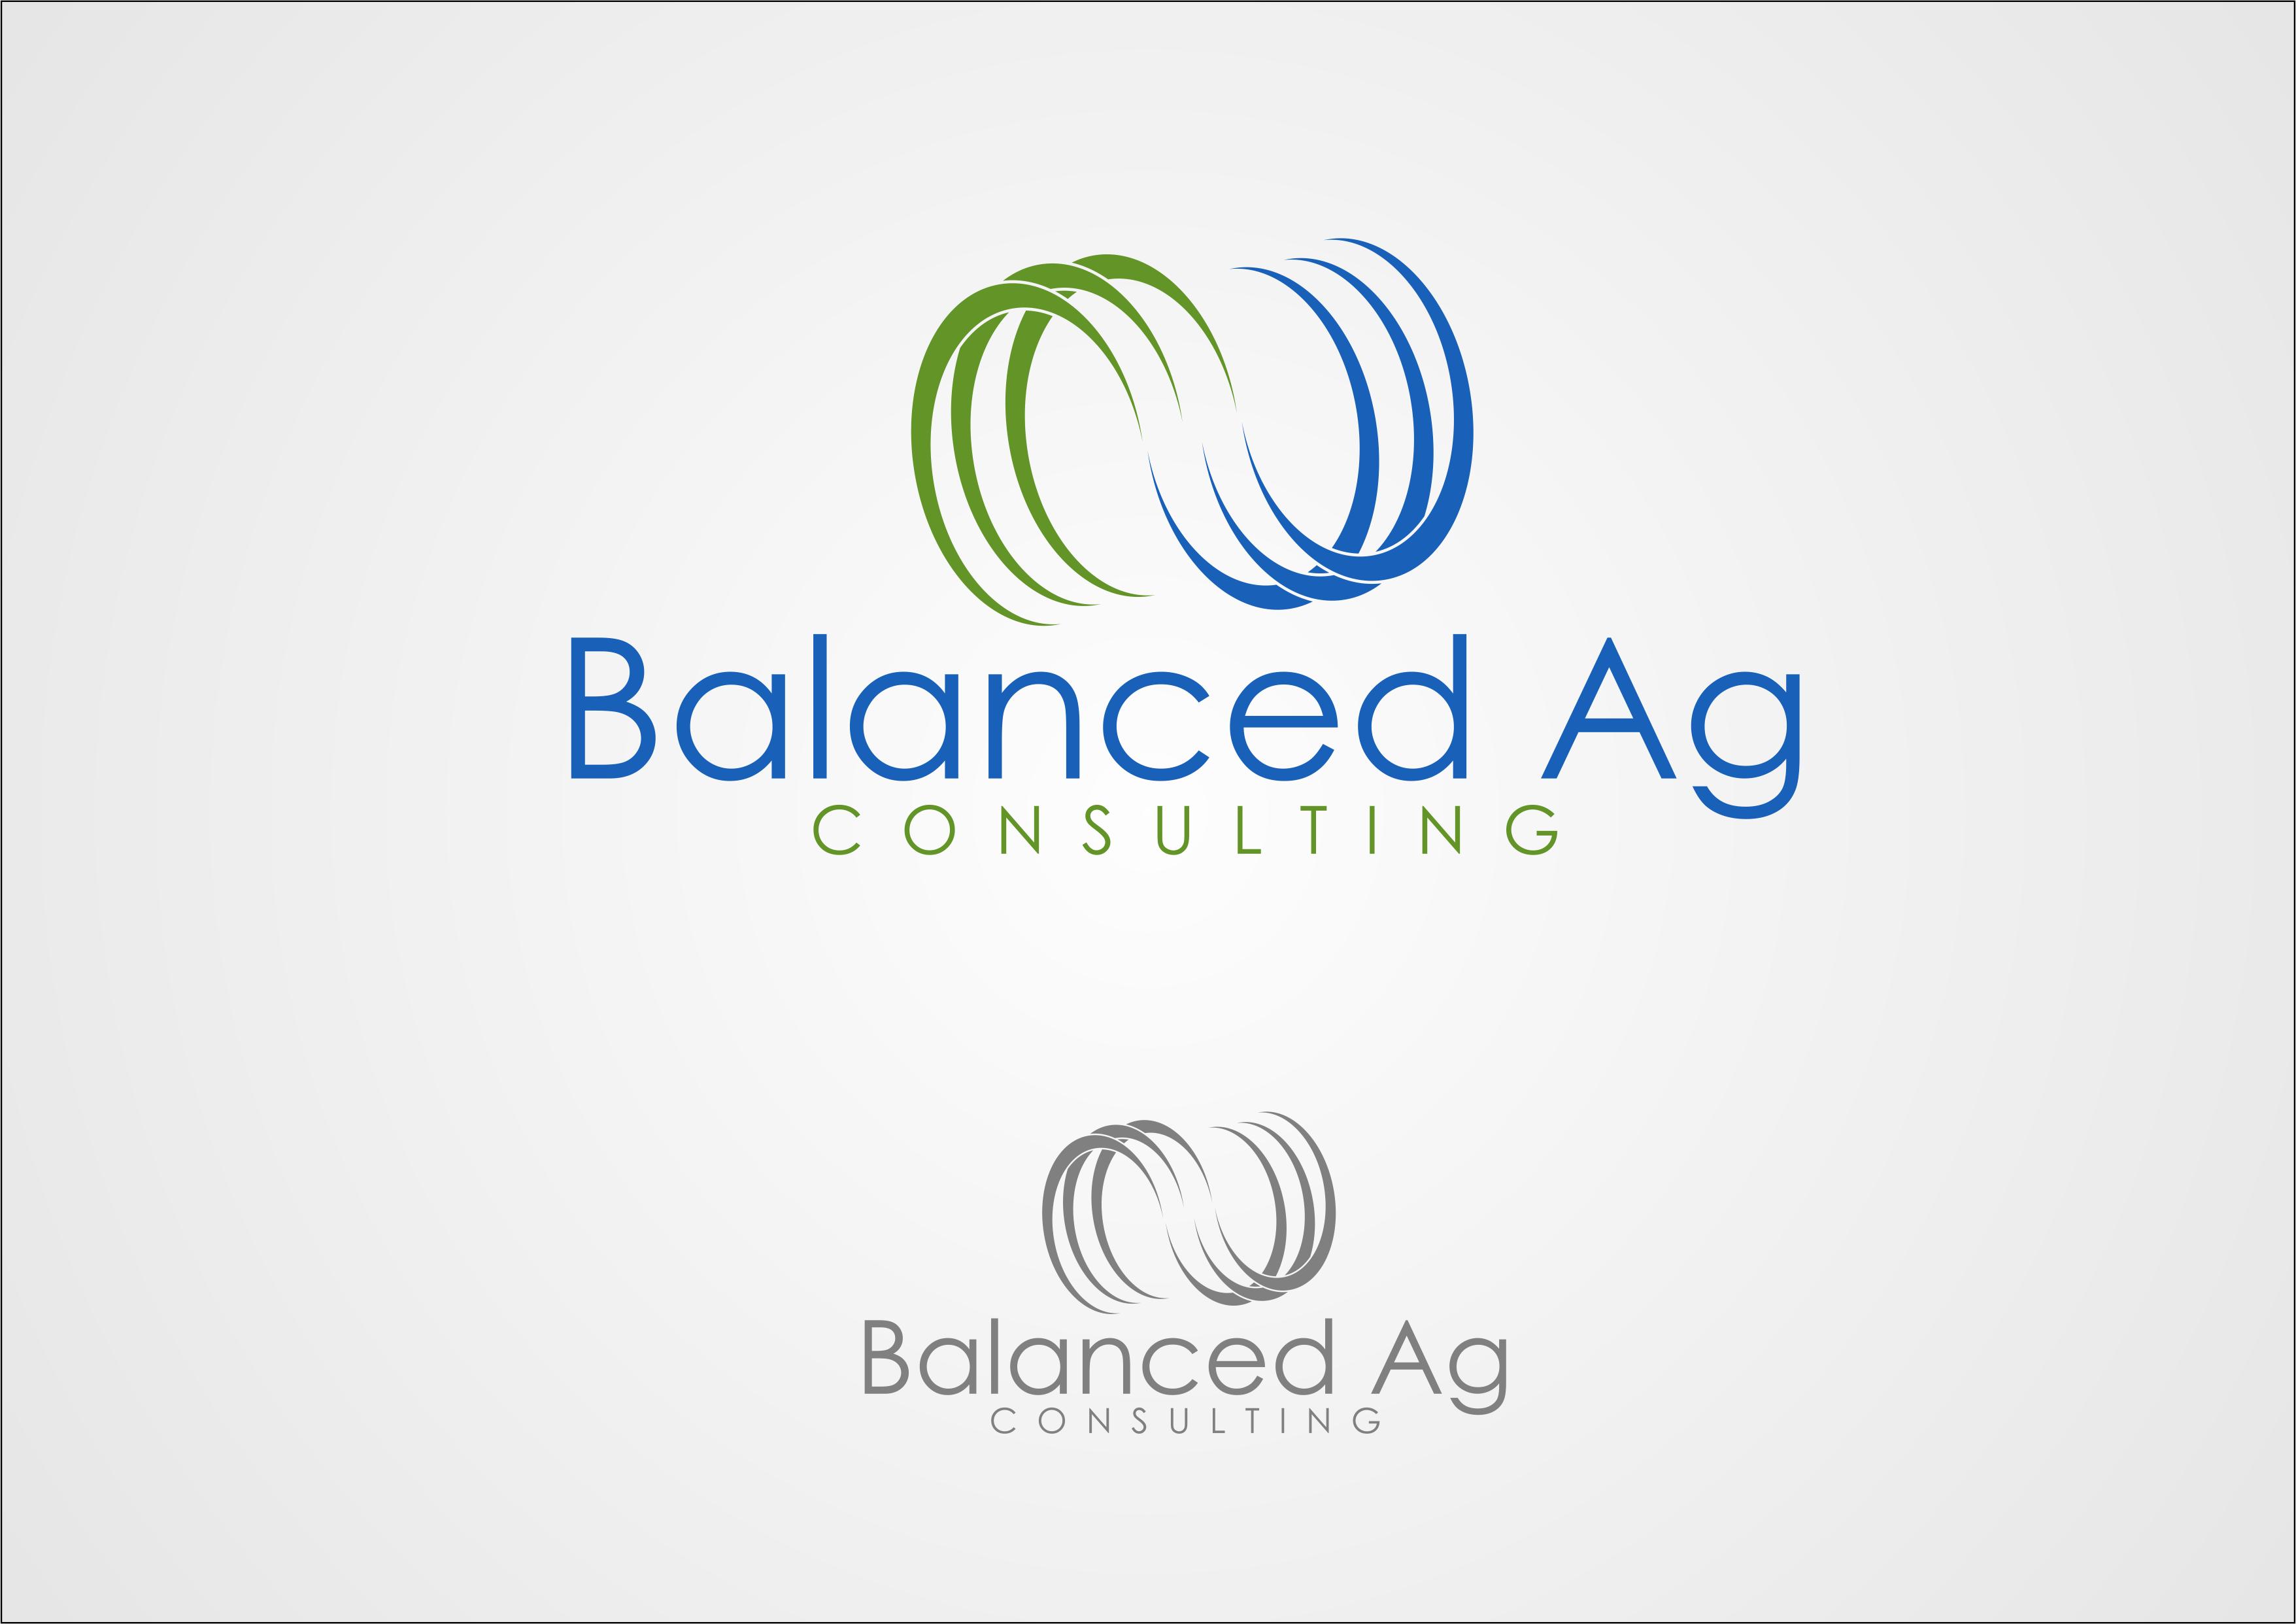 Logo Design by Milan Marijanovic - Entry No. 69 in the Logo Design Contest Captivating Logo Design for Balanced Ag Consulting.